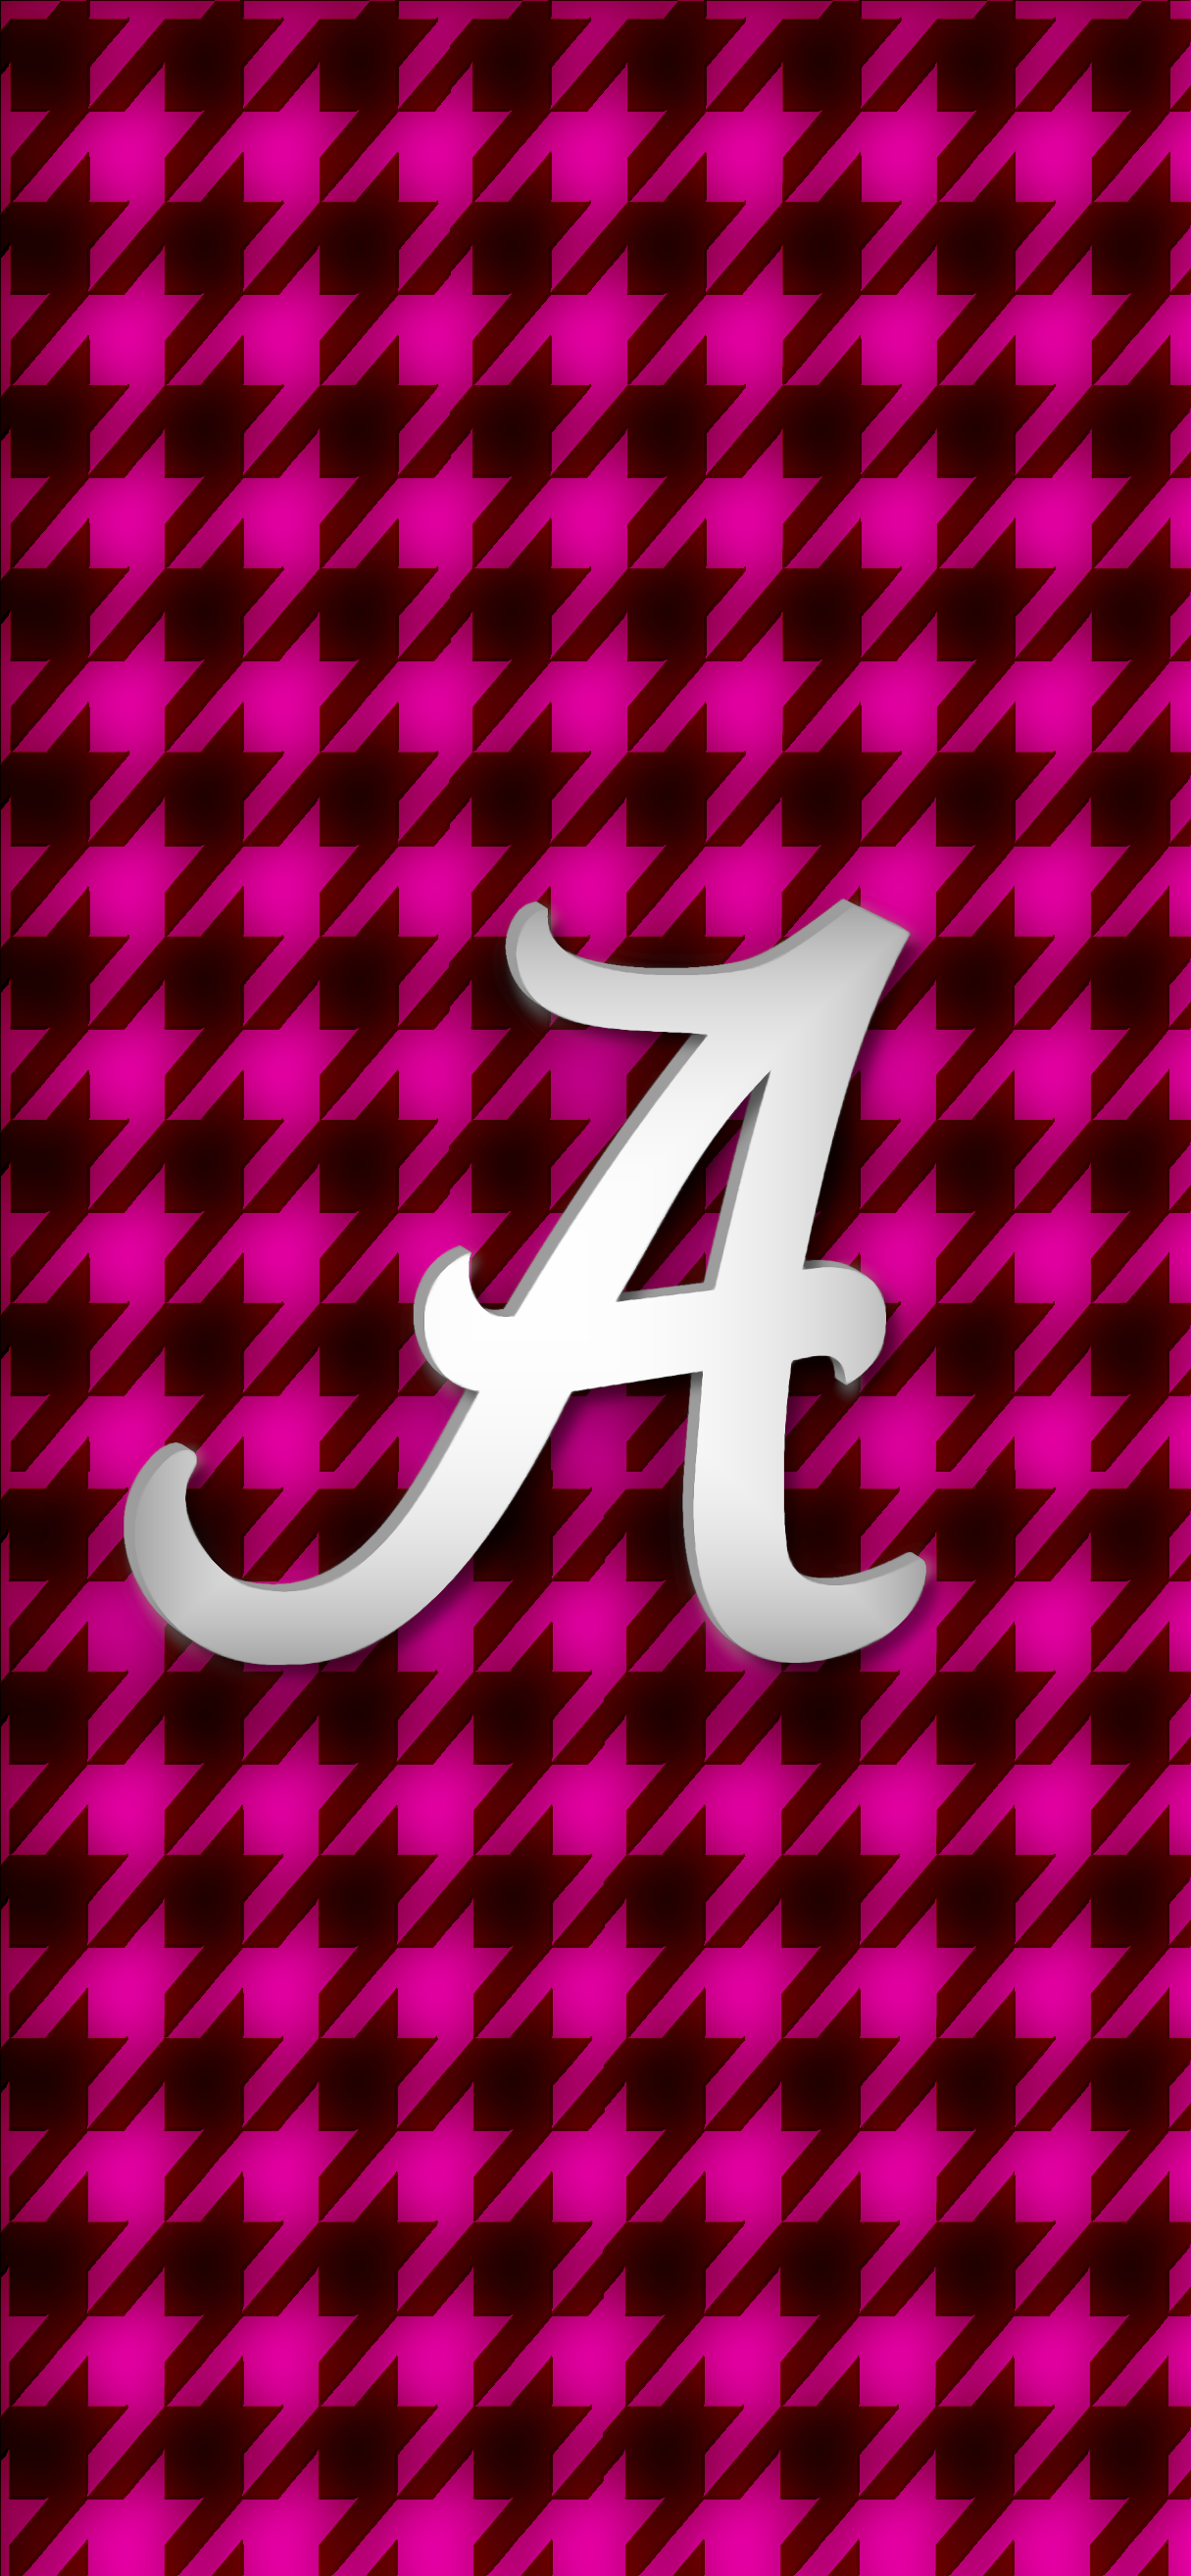 Bama Ht1 Alabama Crimson Tide Alabama Crimson Tide Football Crimson Tide Football